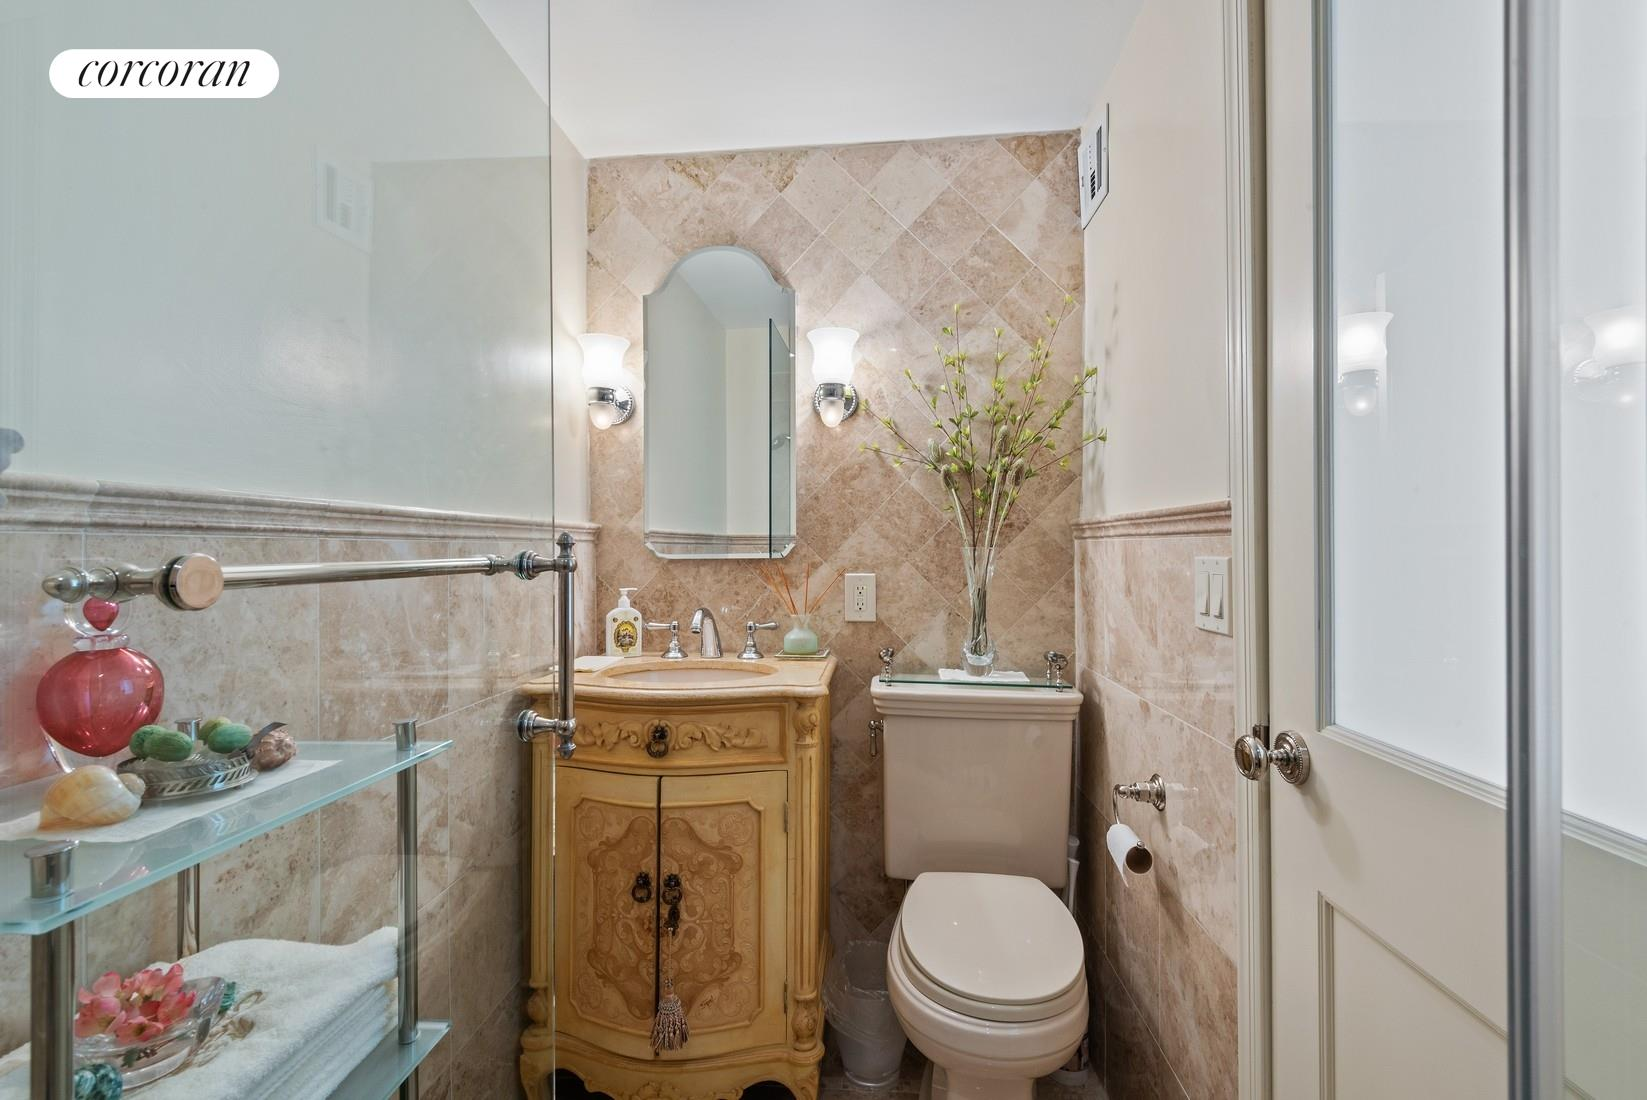 Apartment for sale at 45 Sutton Place South, Apt 20M